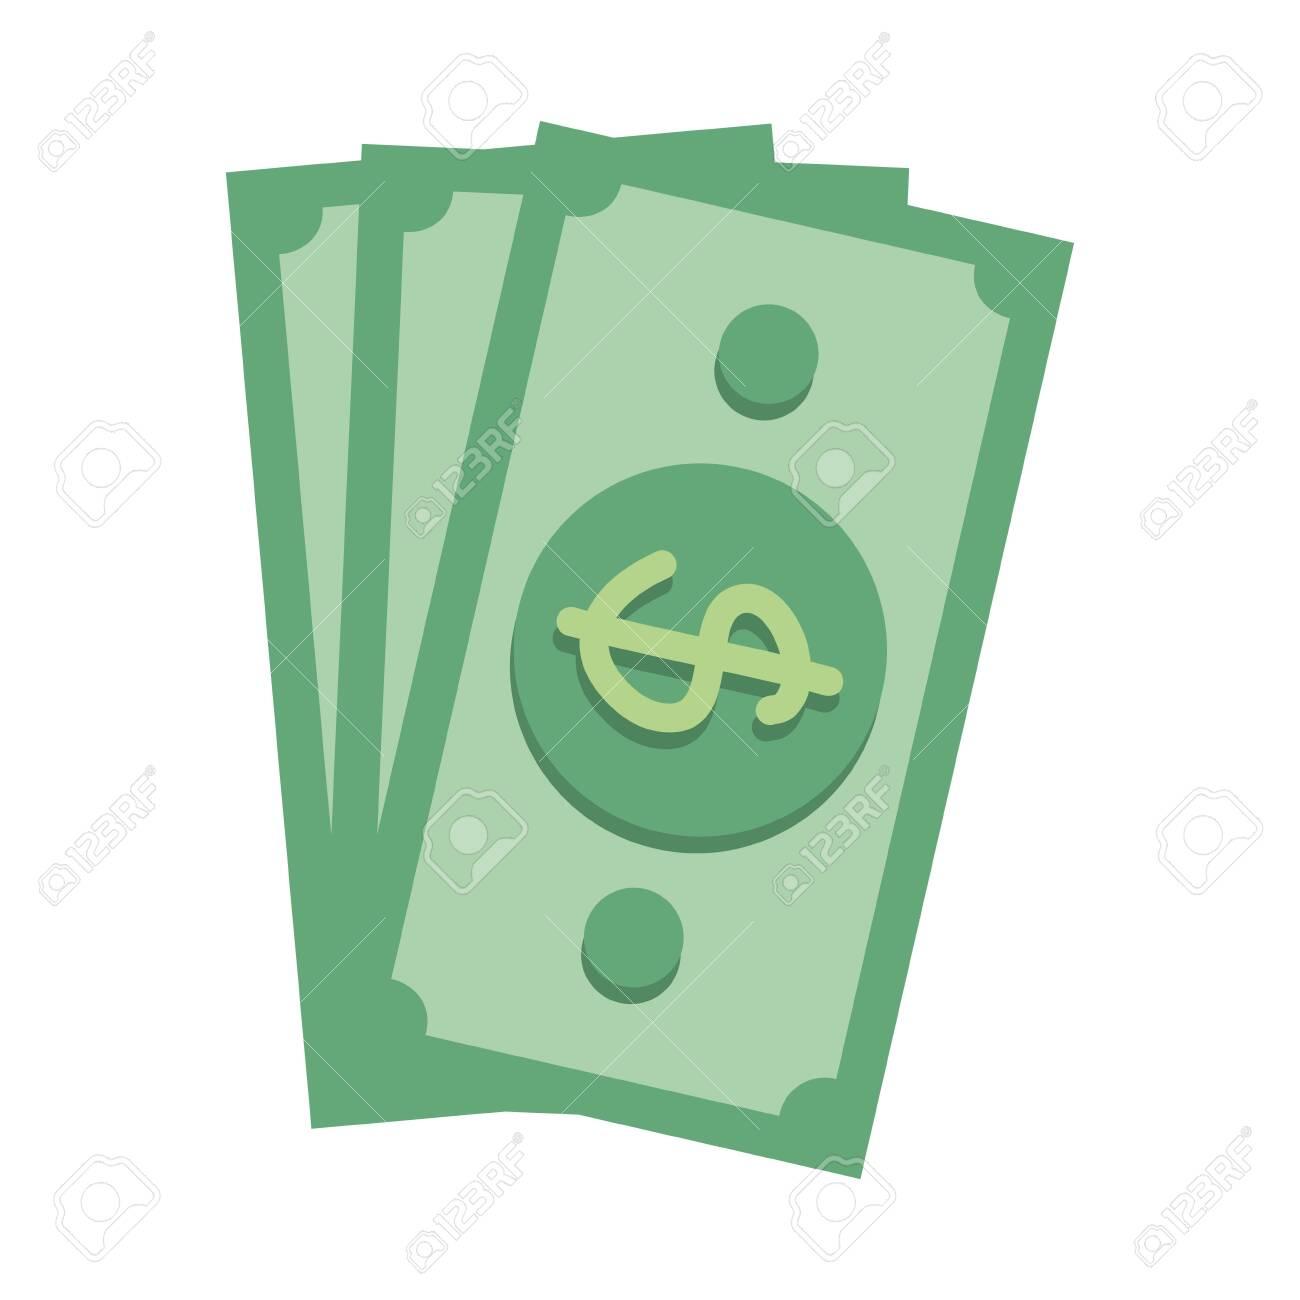 bills dollars isolated icon vector illustration design - 122948407